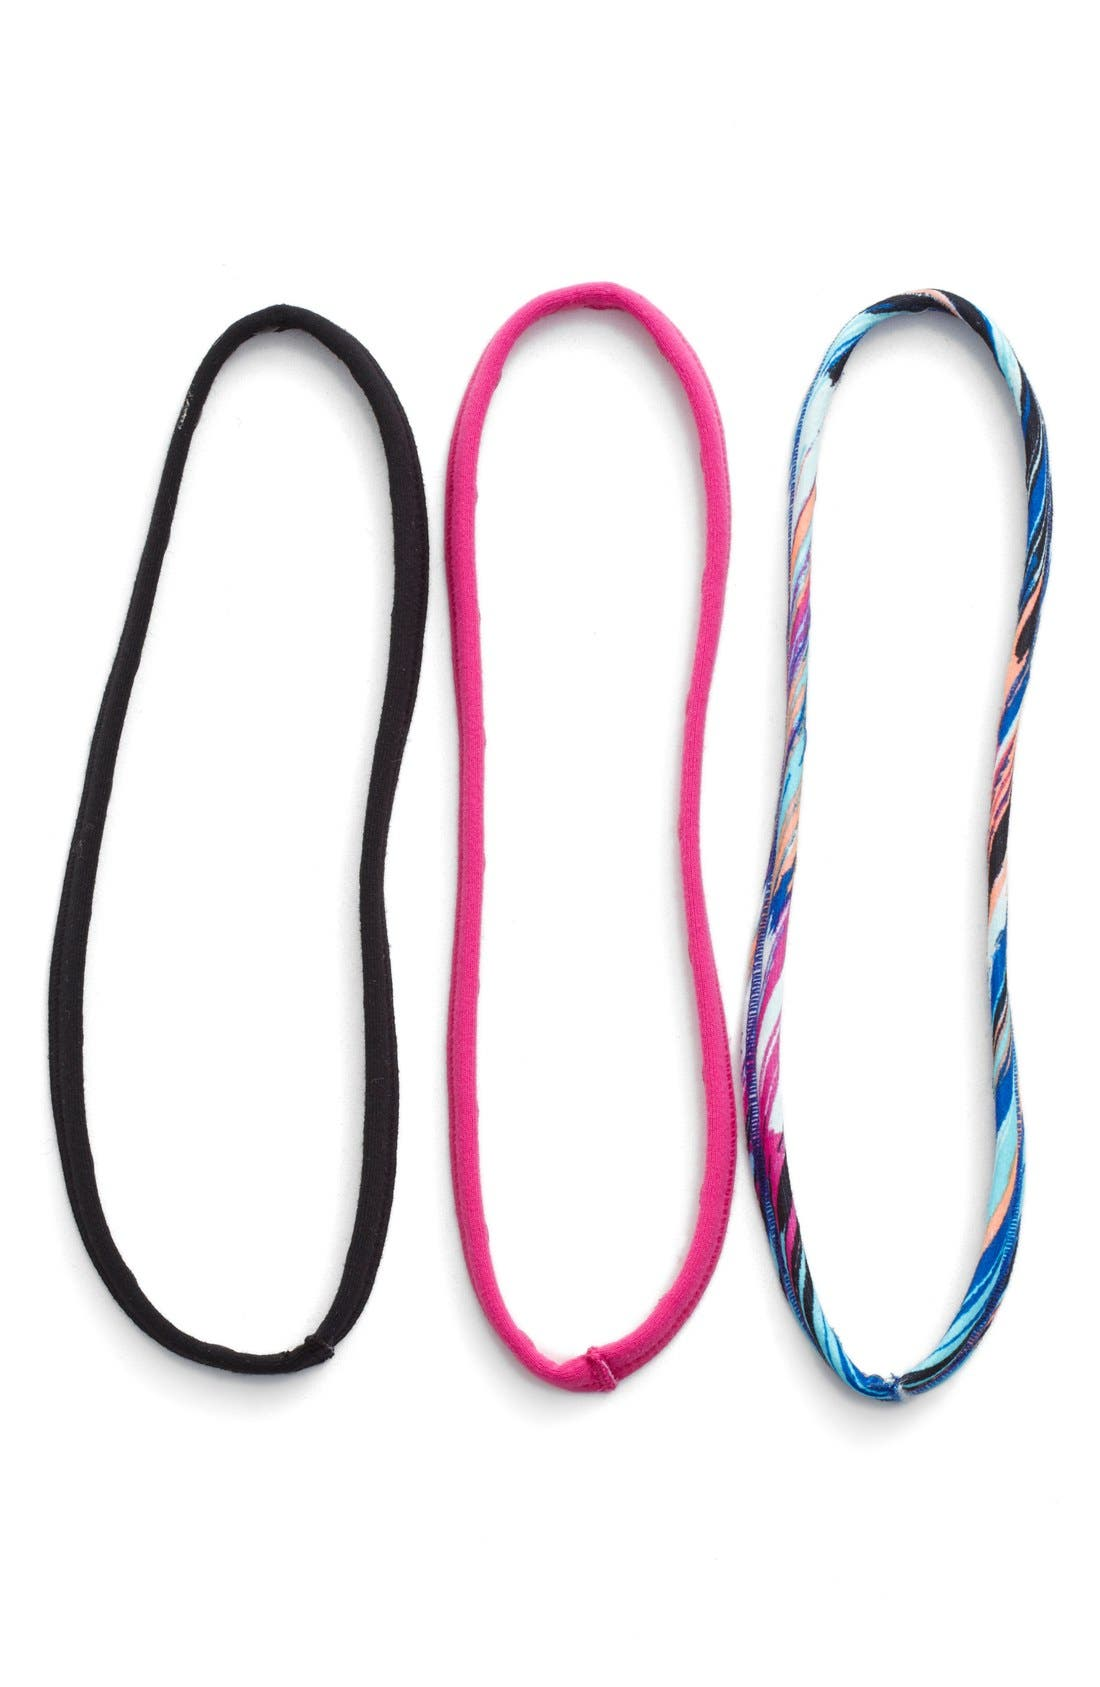 'Skinny Minnie' Headbands,                             Main thumbnail 1, color,                             Pink Cyclamen